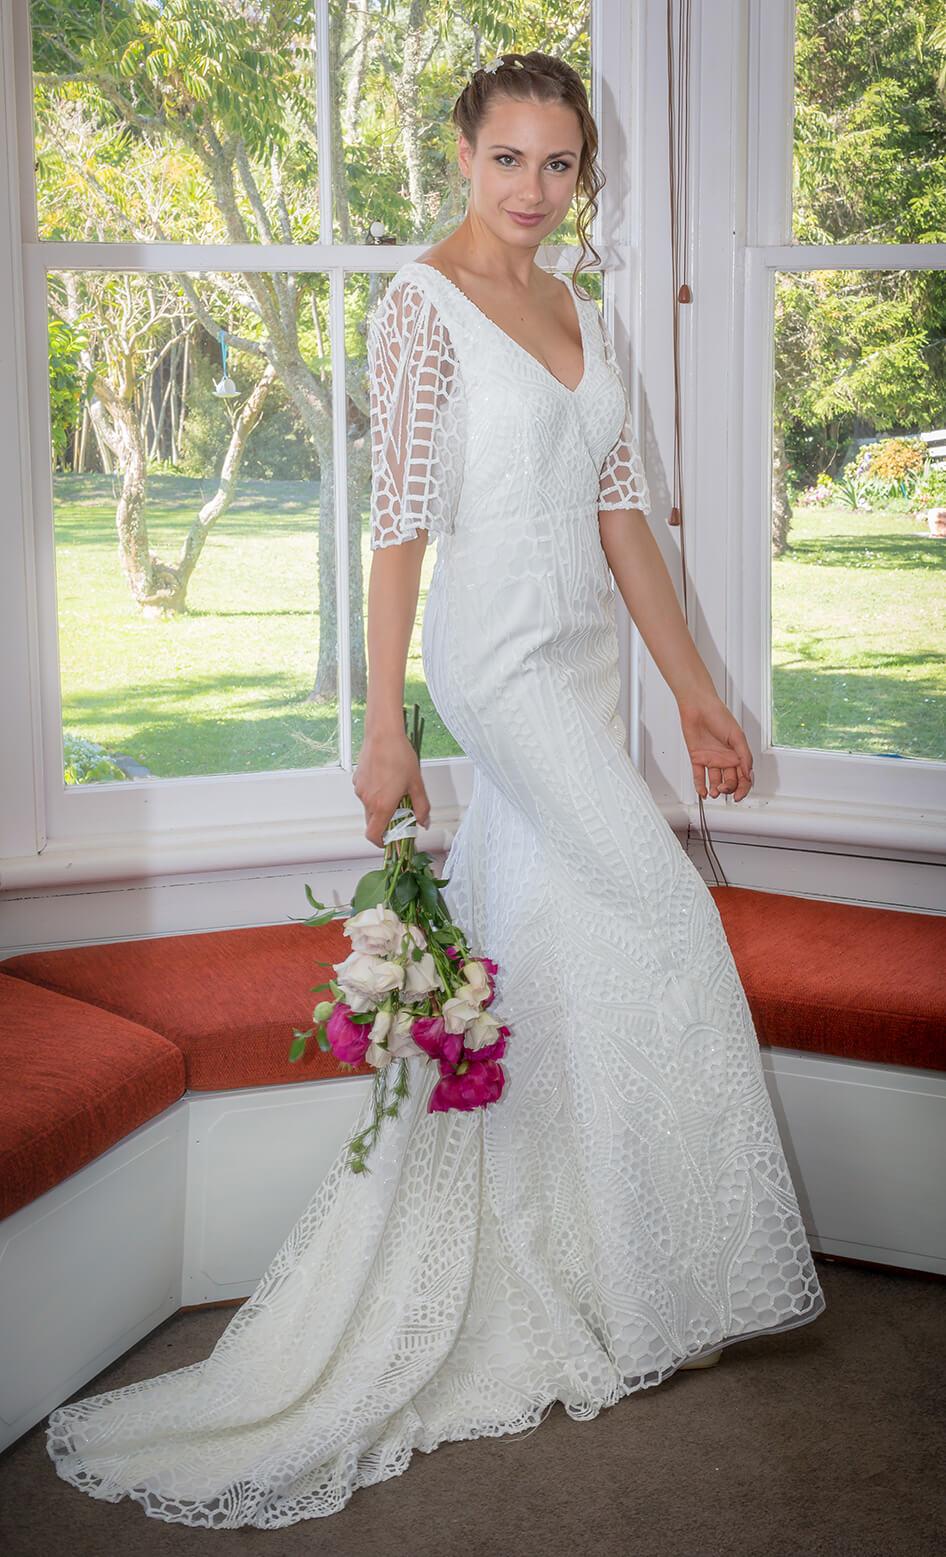 elizabeth may bridal honour collection 6.jpg